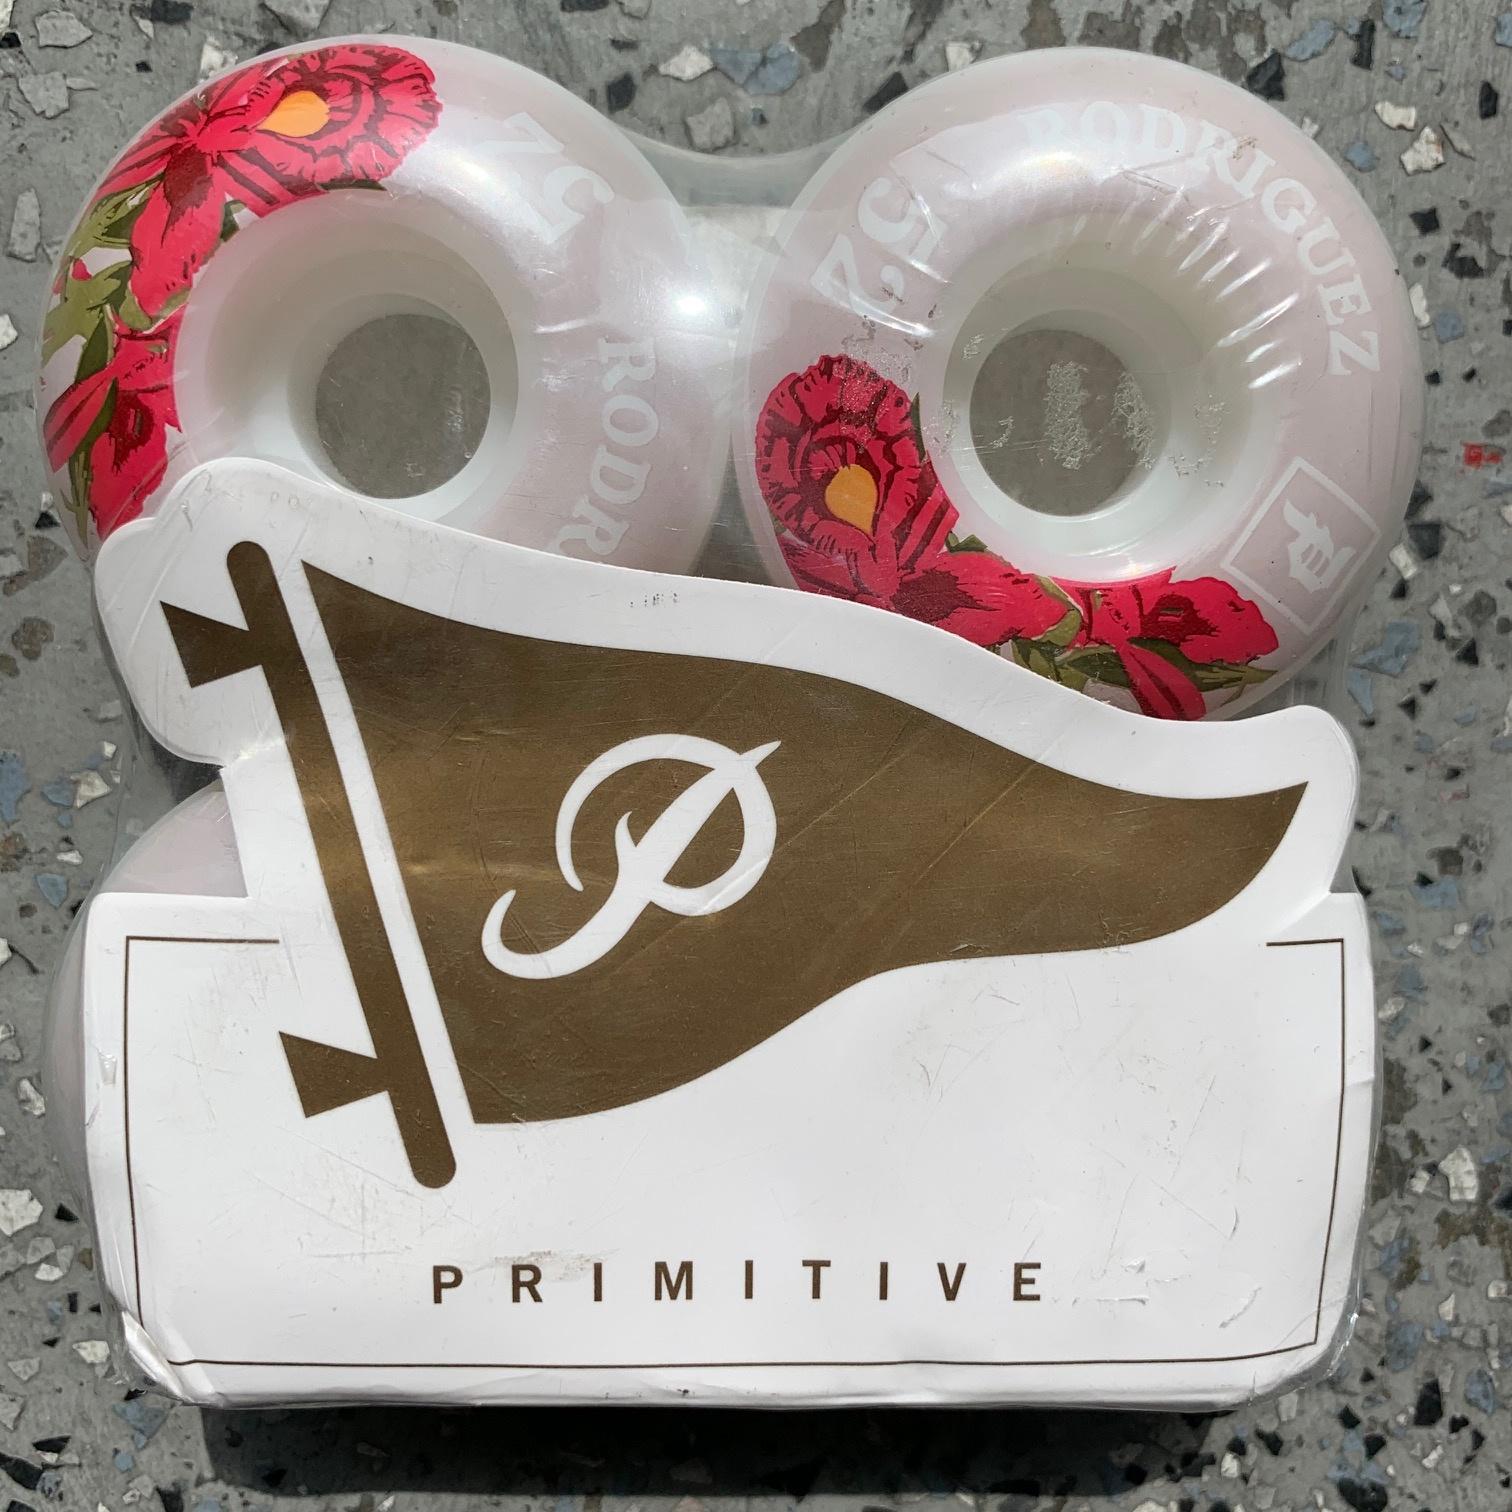 Primitive primitive 52mm rodriguez wheels